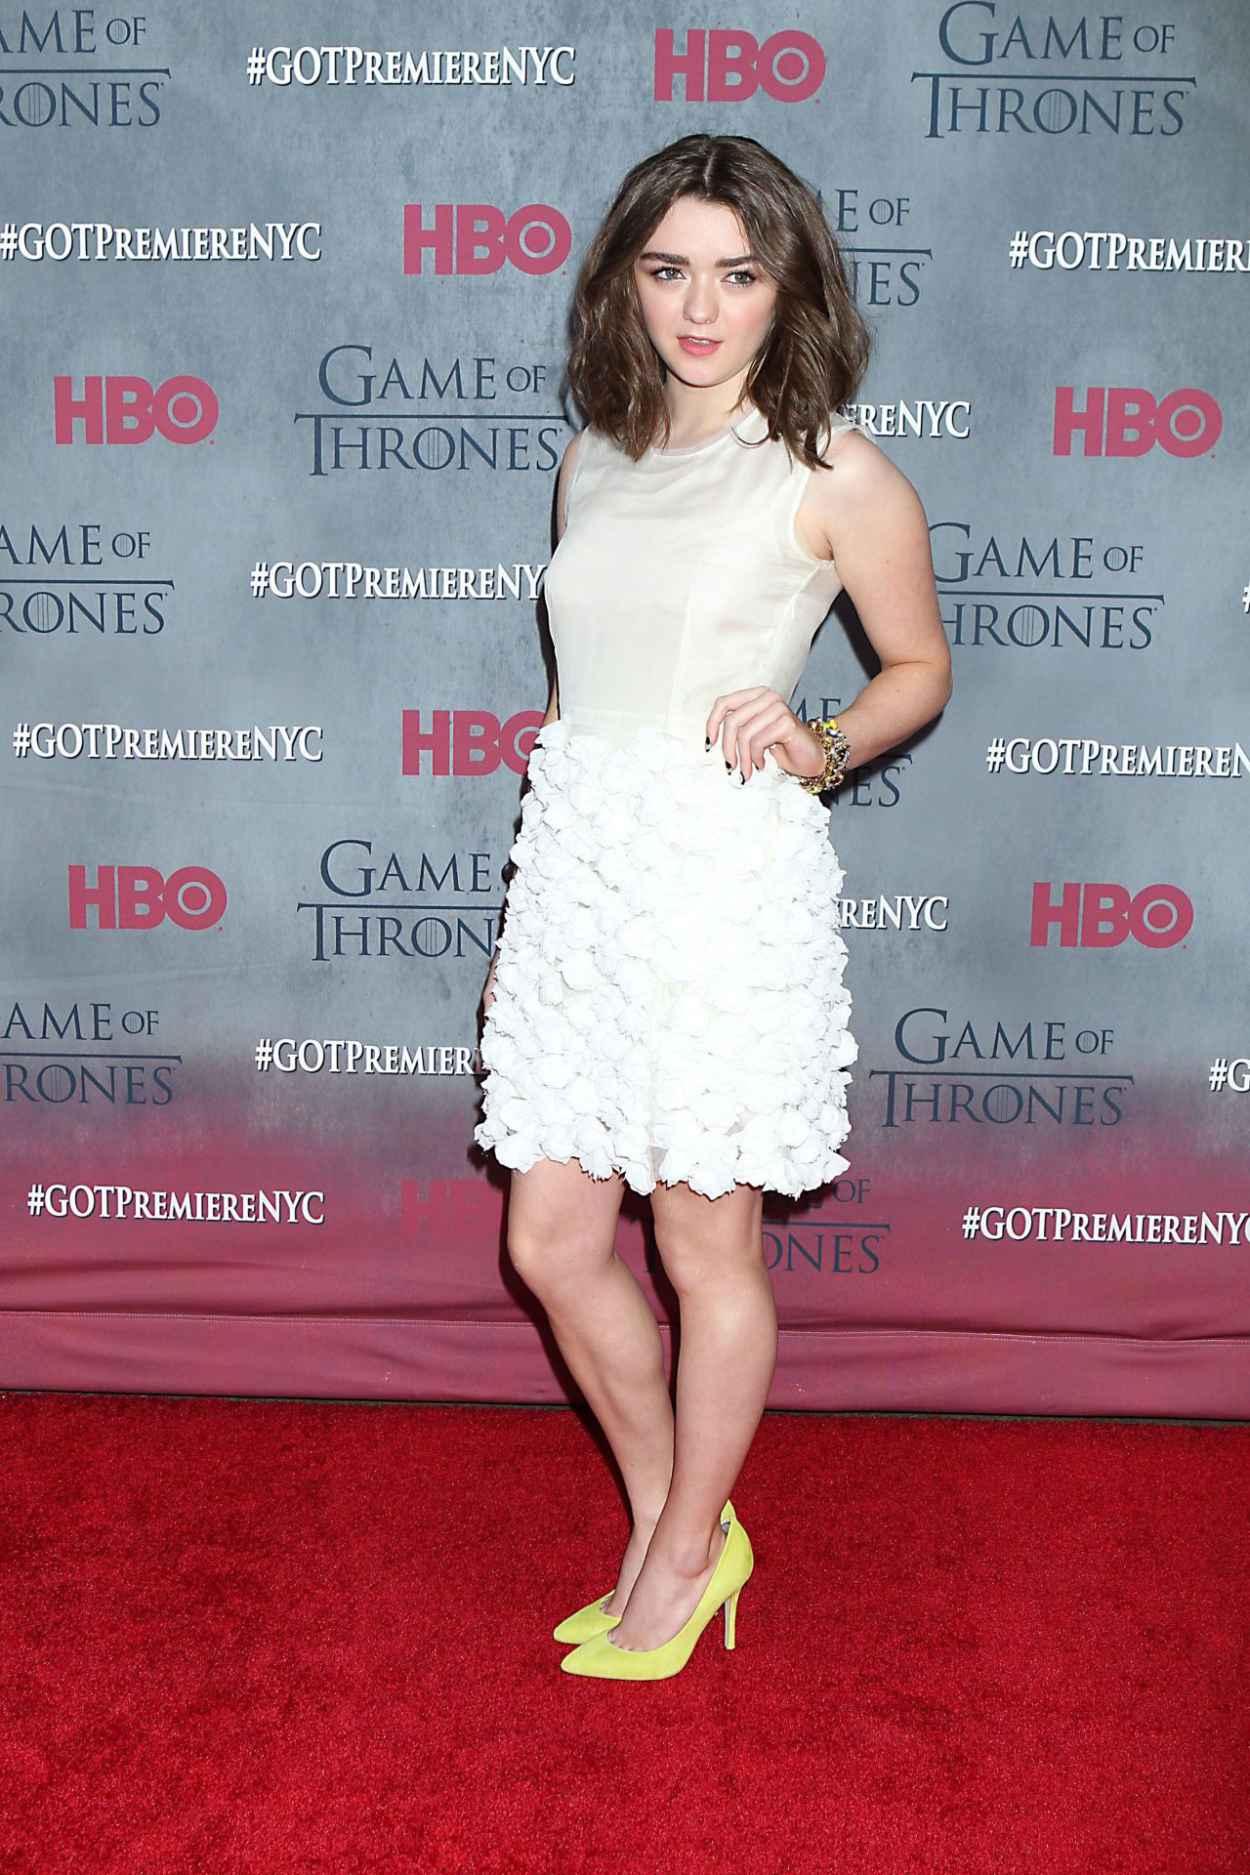 Maisie Williams - -Game of Thrones- Season 4 Premiere in New York City-1